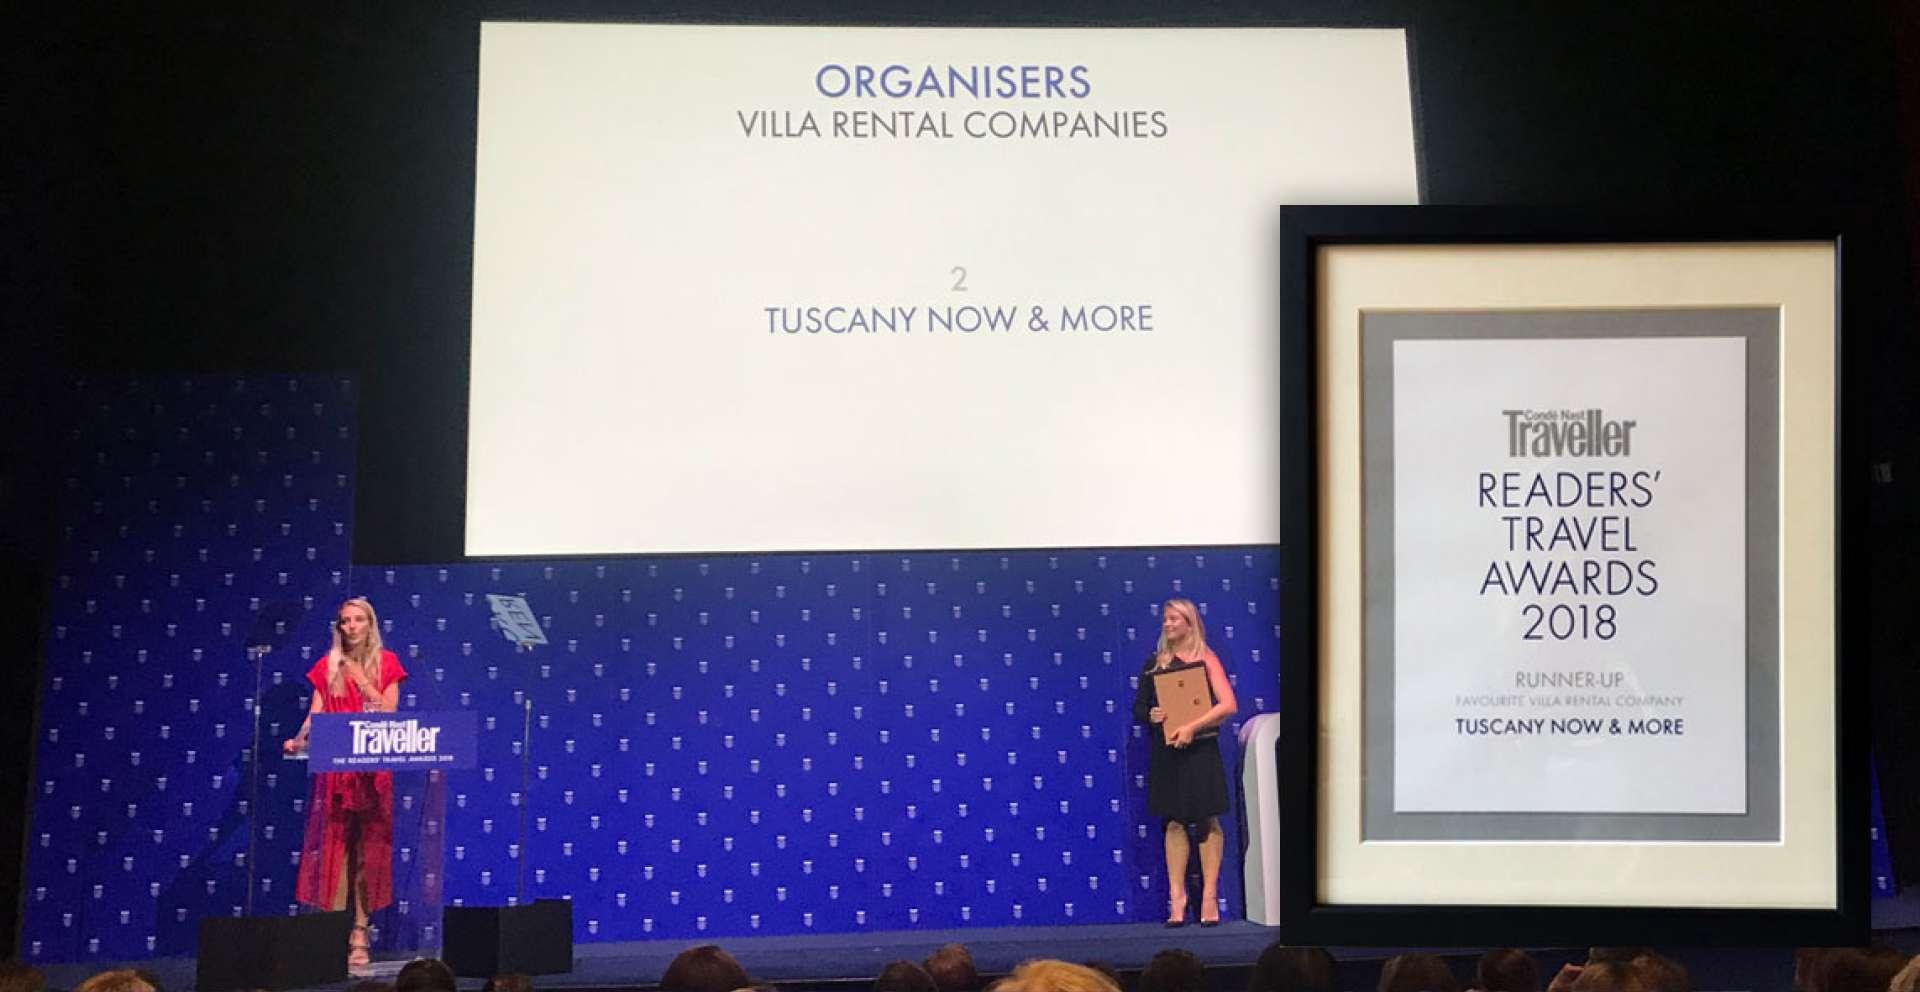 Condé Nast Travel Awards 2018: Tuscany Now and More officially Tuscany's top villa company